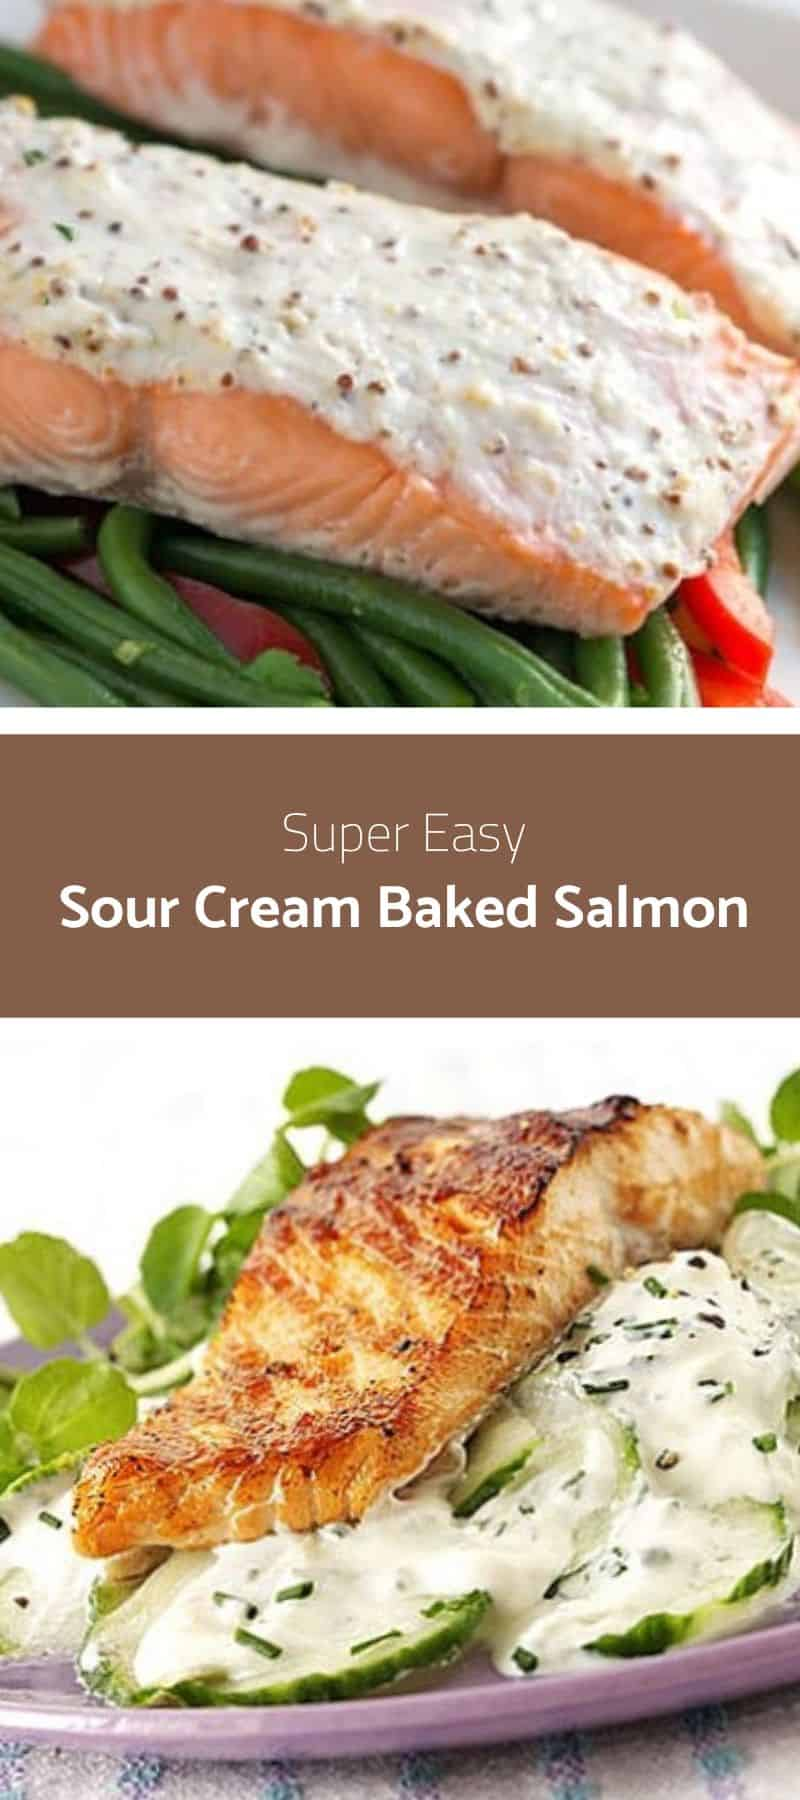 Sour Cream Baked Salmon 3